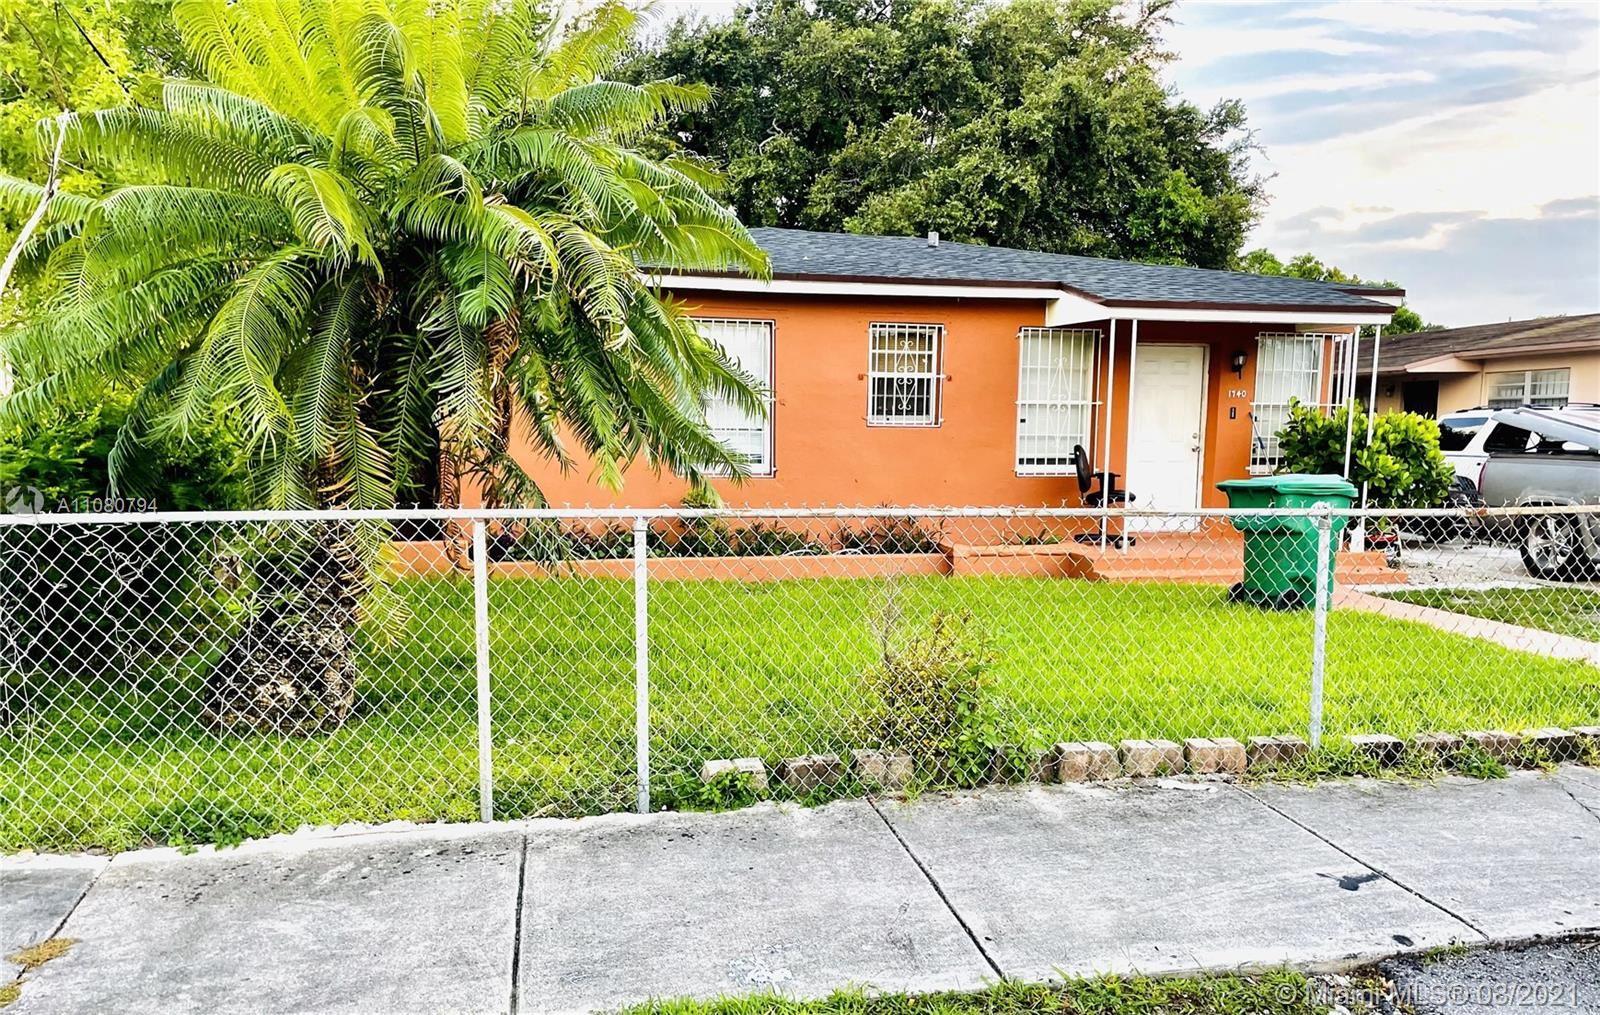 1740 NW 51st St, Miami, FL 33142 - #: A11080794